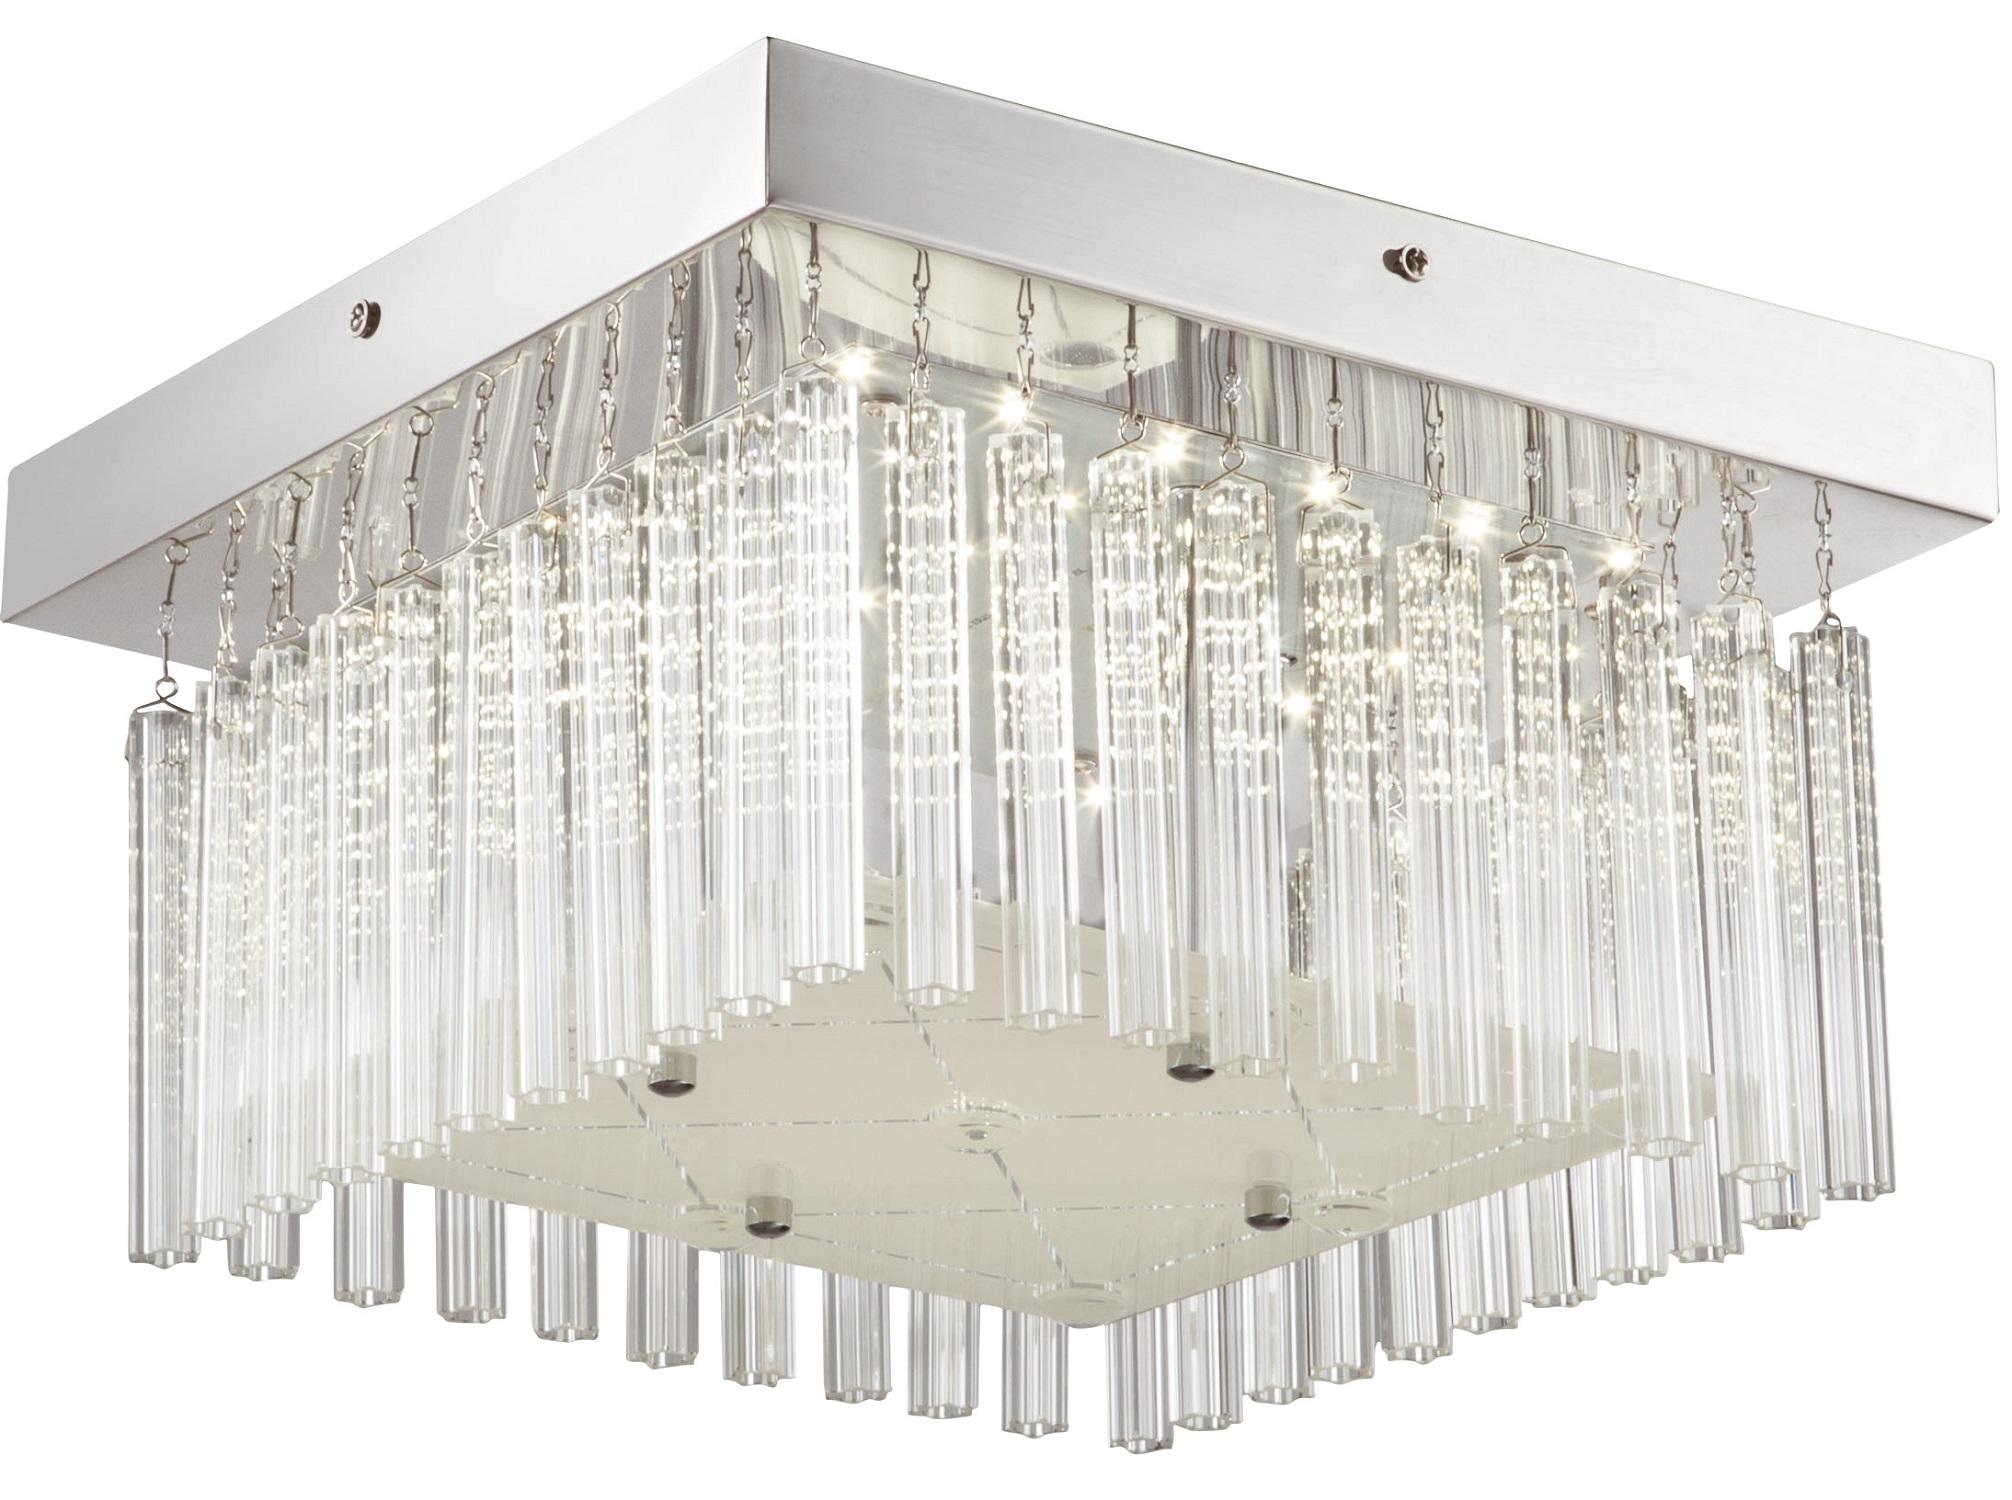 Светильник потолочныйПотолочные светильники<br>&amp;lt;div&amp;gt;&amp;lt;div&amp;gt;Вид цоколя: LED&amp;lt;/div&amp;gt;&amp;lt;div&amp;gt;Мощность: &amp;amp;nbsp;18W&amp;amp;nbsp;&amp;lt;/div&amp;gt;&amp;lt;div&amp;gt;Количество ламп: 1 (в комплекте)&amp;lt;/div&amp;gt;&amp;lt;/div&amp;gt;<br><br>Material: Стекло<br>Ширина см: 30<br>Высота см: 18<br>Глубина см: 30